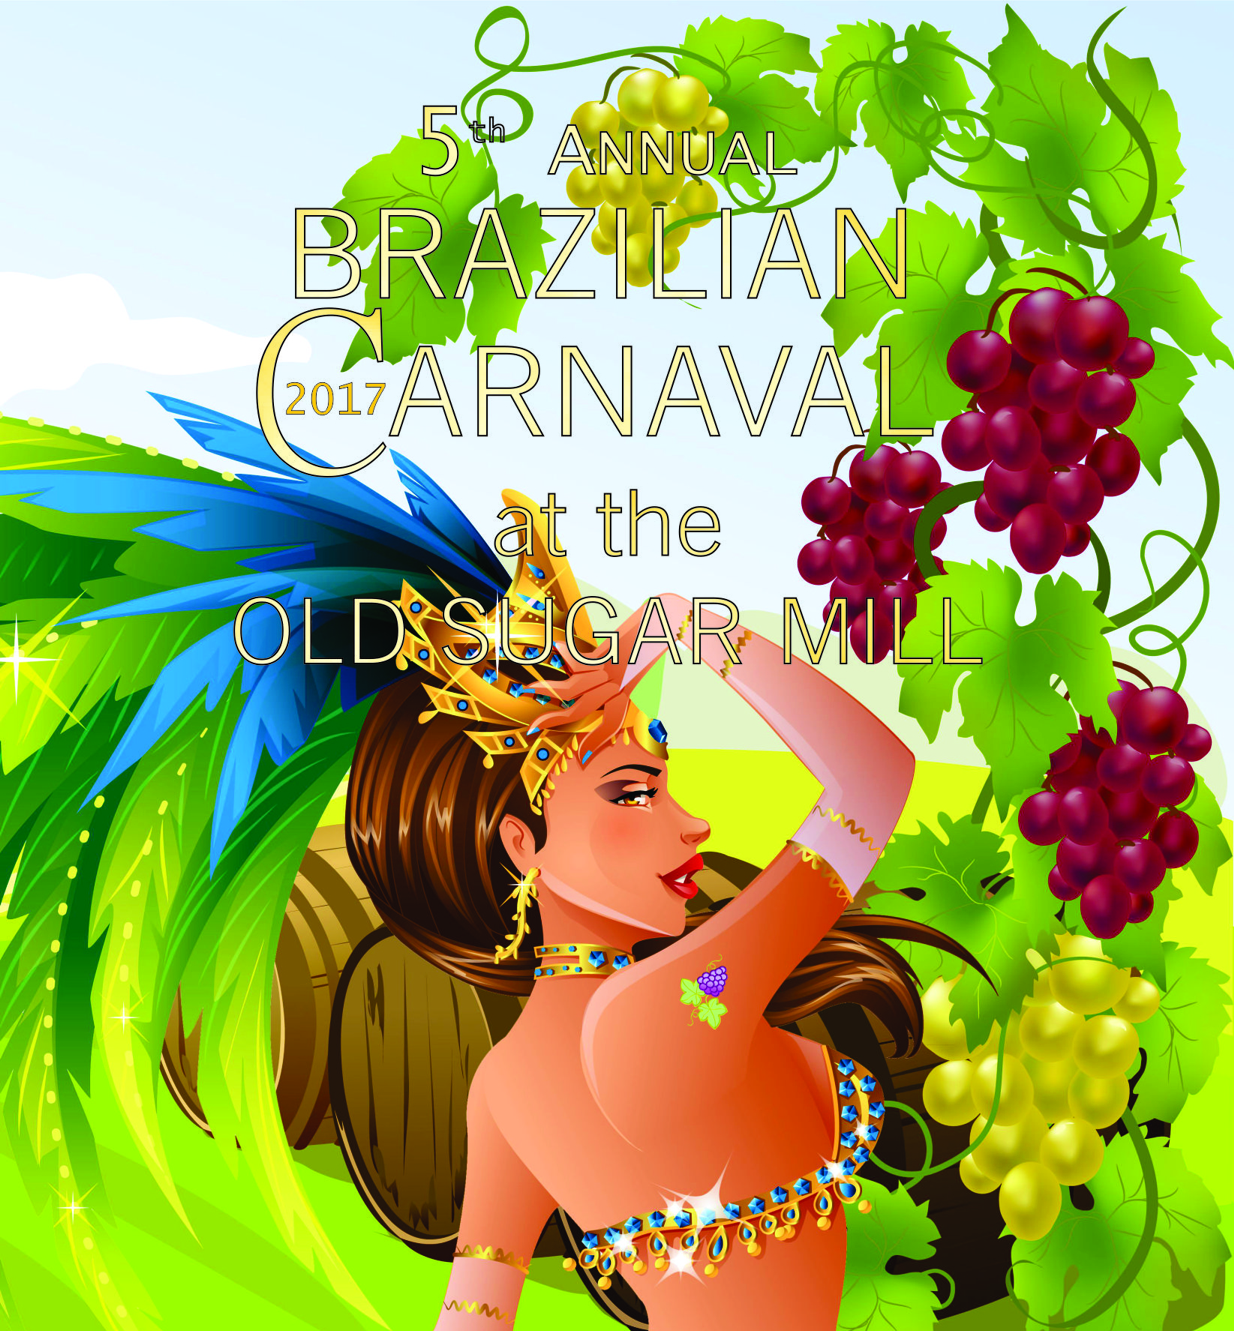 5th Annual Brazilian Carnaval